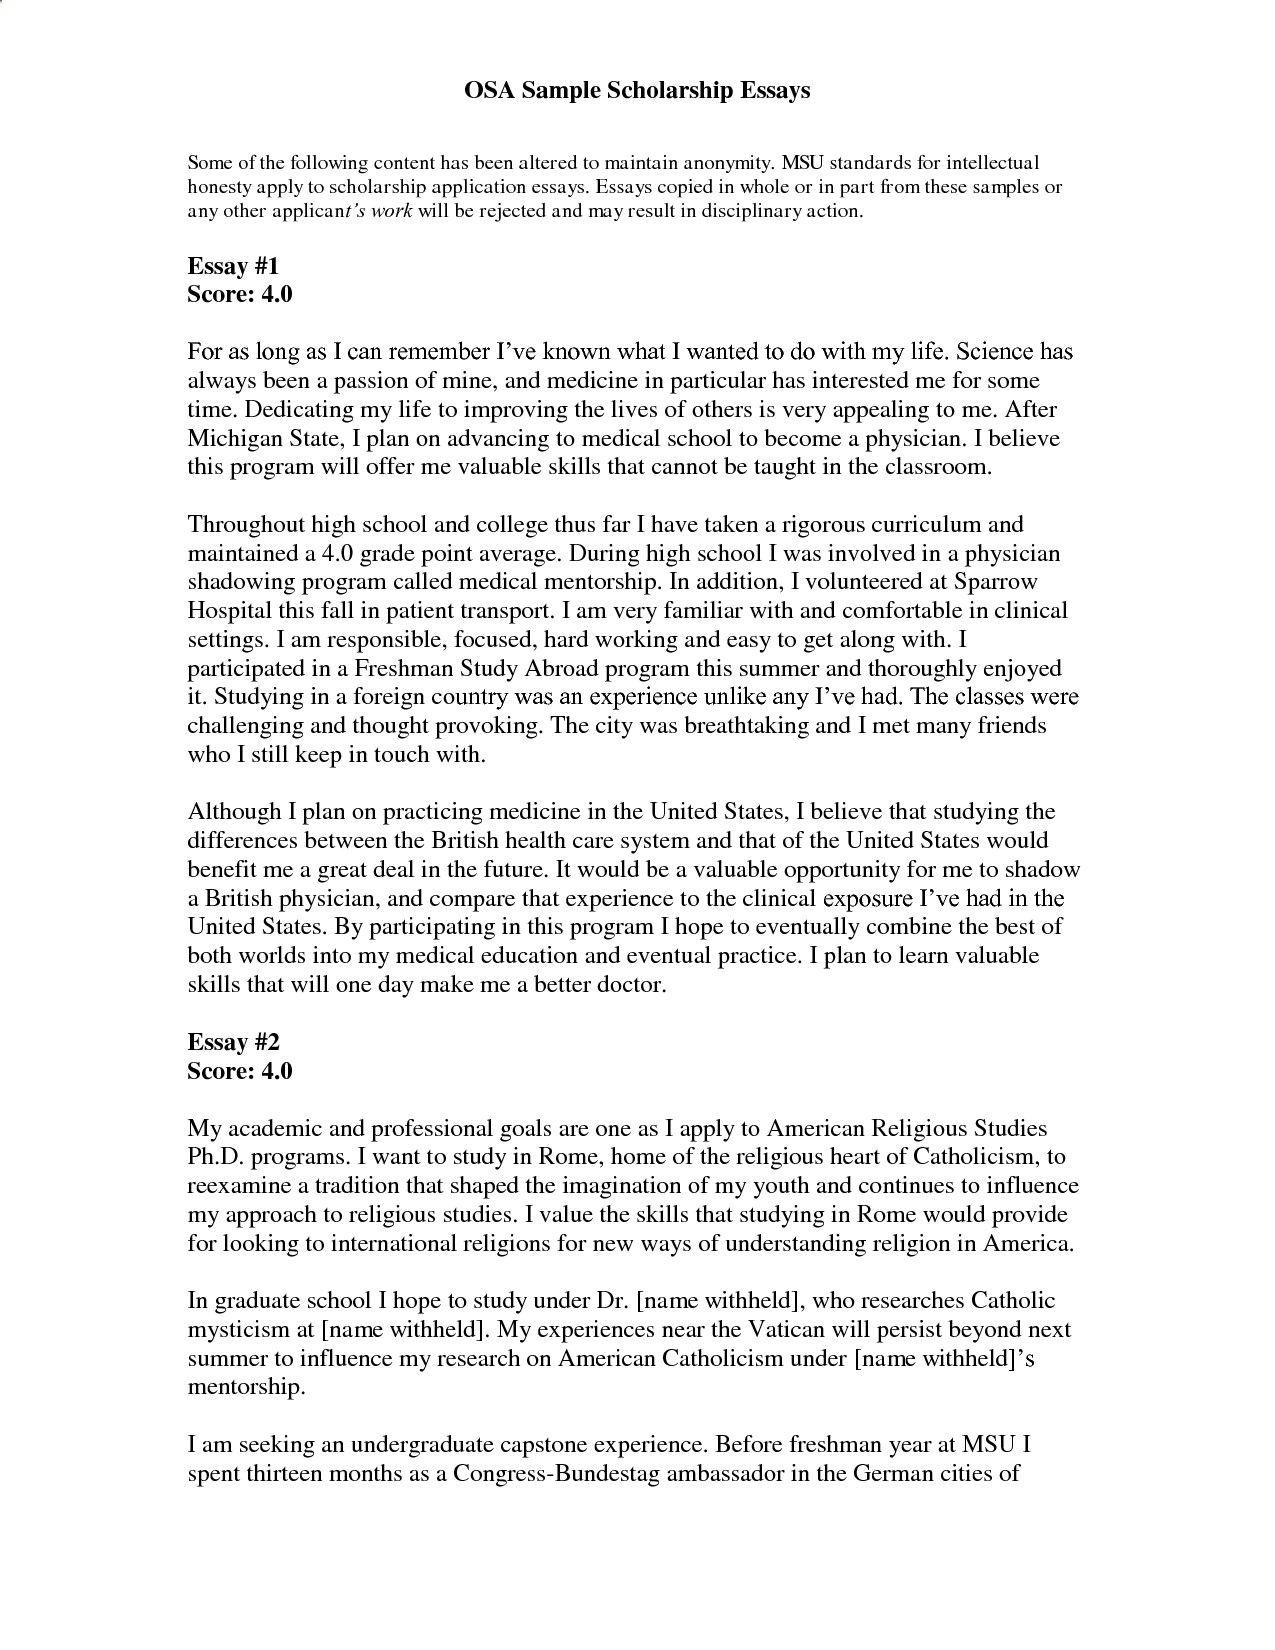 Pin On Write Paper Service Mentorship In Nursing Essay